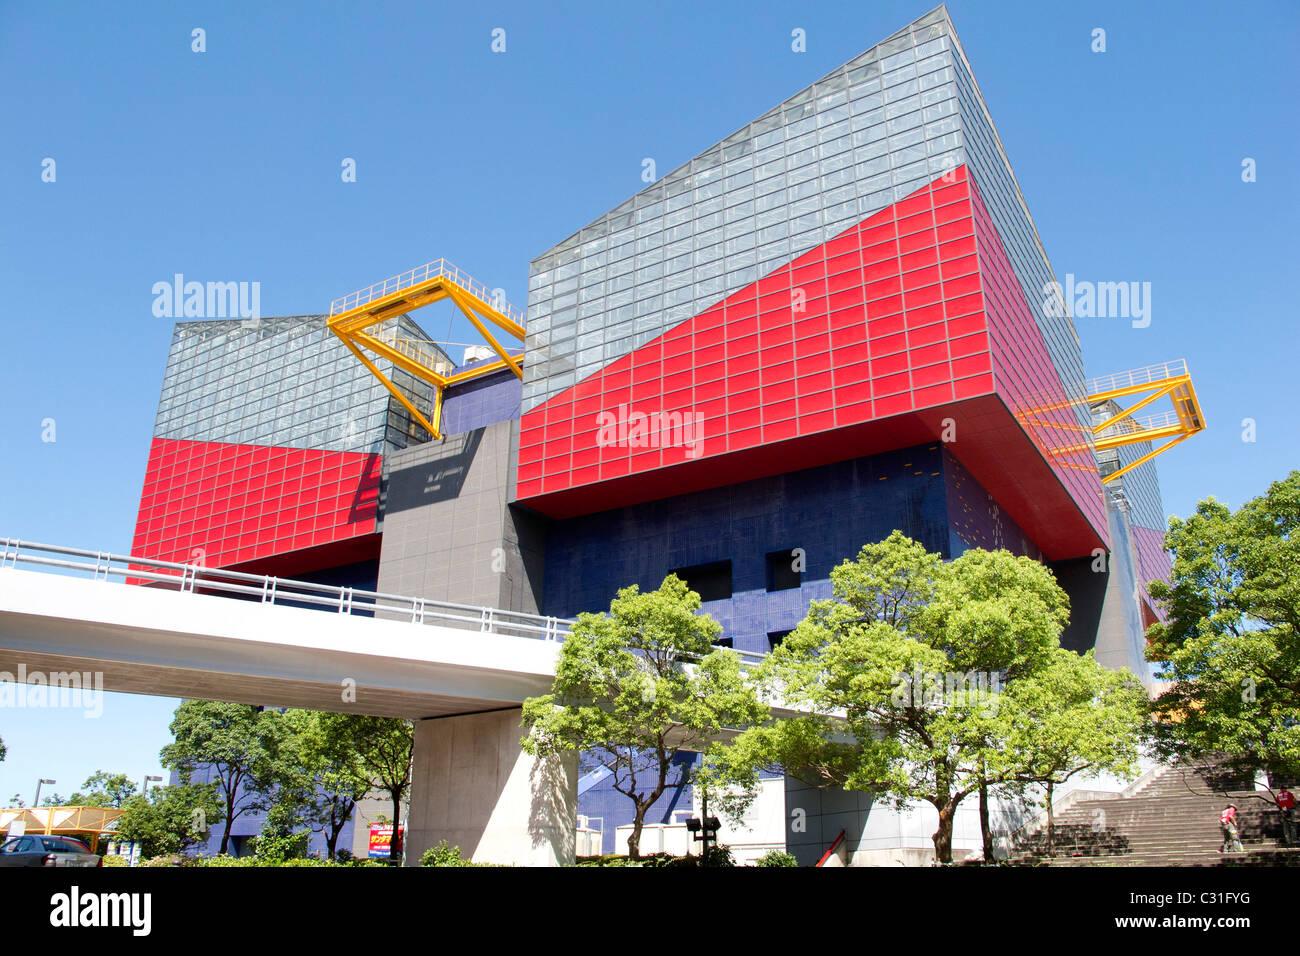 DIE SUNTORY MUSEUM, ERBAUT VON TADAO ANDO, SPEZIALISIERT AUF GRAFIK, TEMPOZAN NACHBARSCHAFT, OSAKA, JAPAN Stockbild